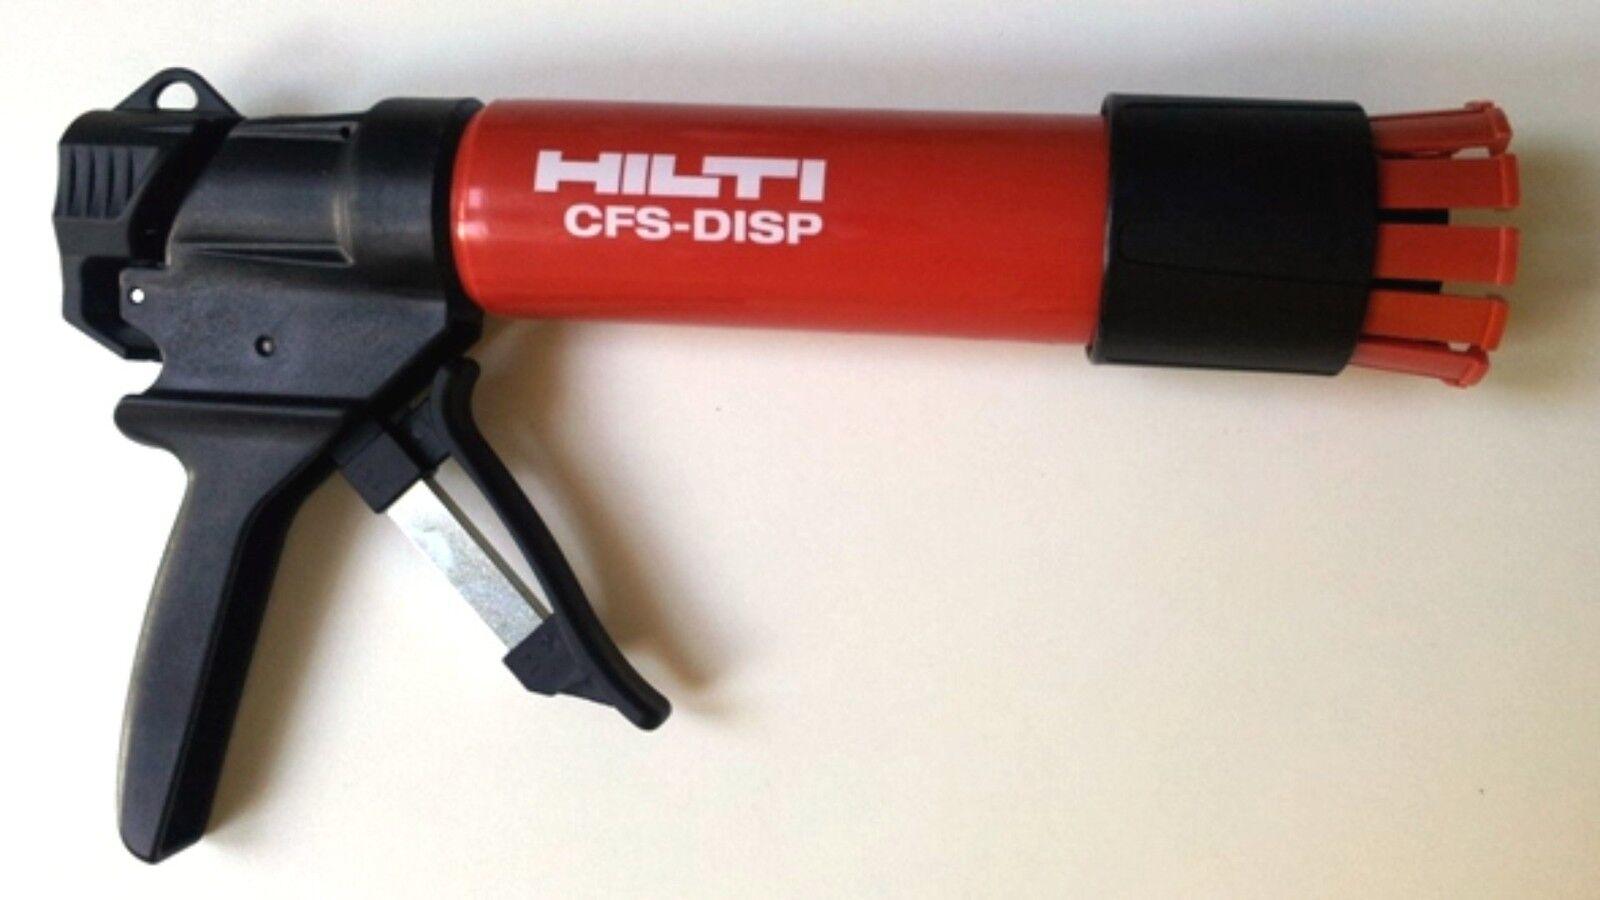 HILTI Silikon - Acryl - Auspressgerät CFS-DISP Kartuschenpresse Dispencer